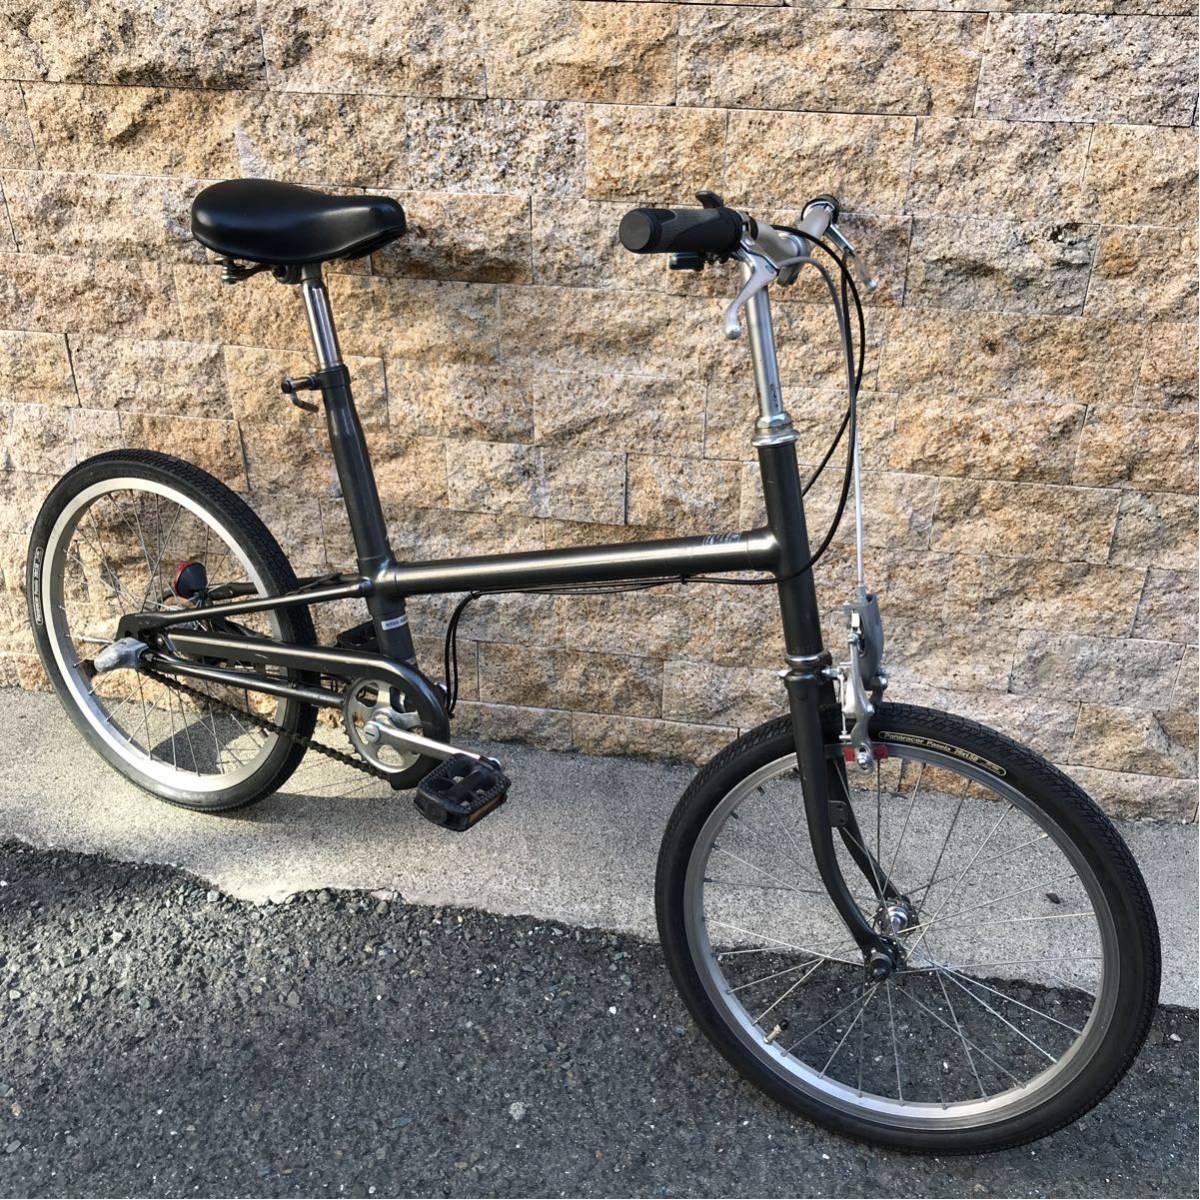 MUJI 無印良品 20インチ 自転車 ミニベロ カスタム自転車 改造 ガンメタ 小径車 内装3段